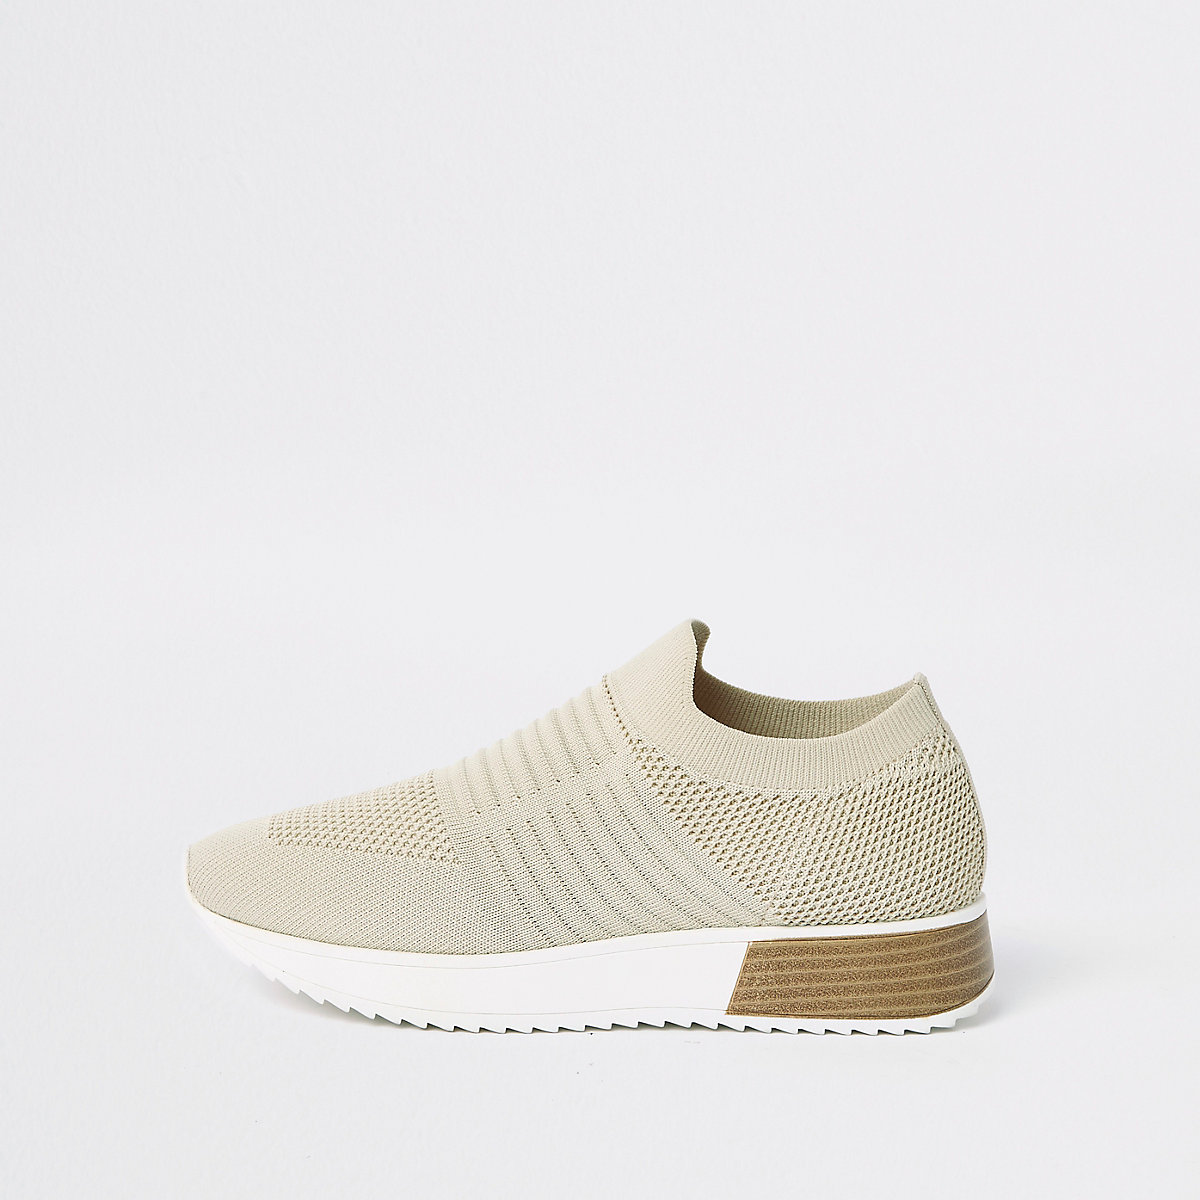 Beige knitted runner sneakers